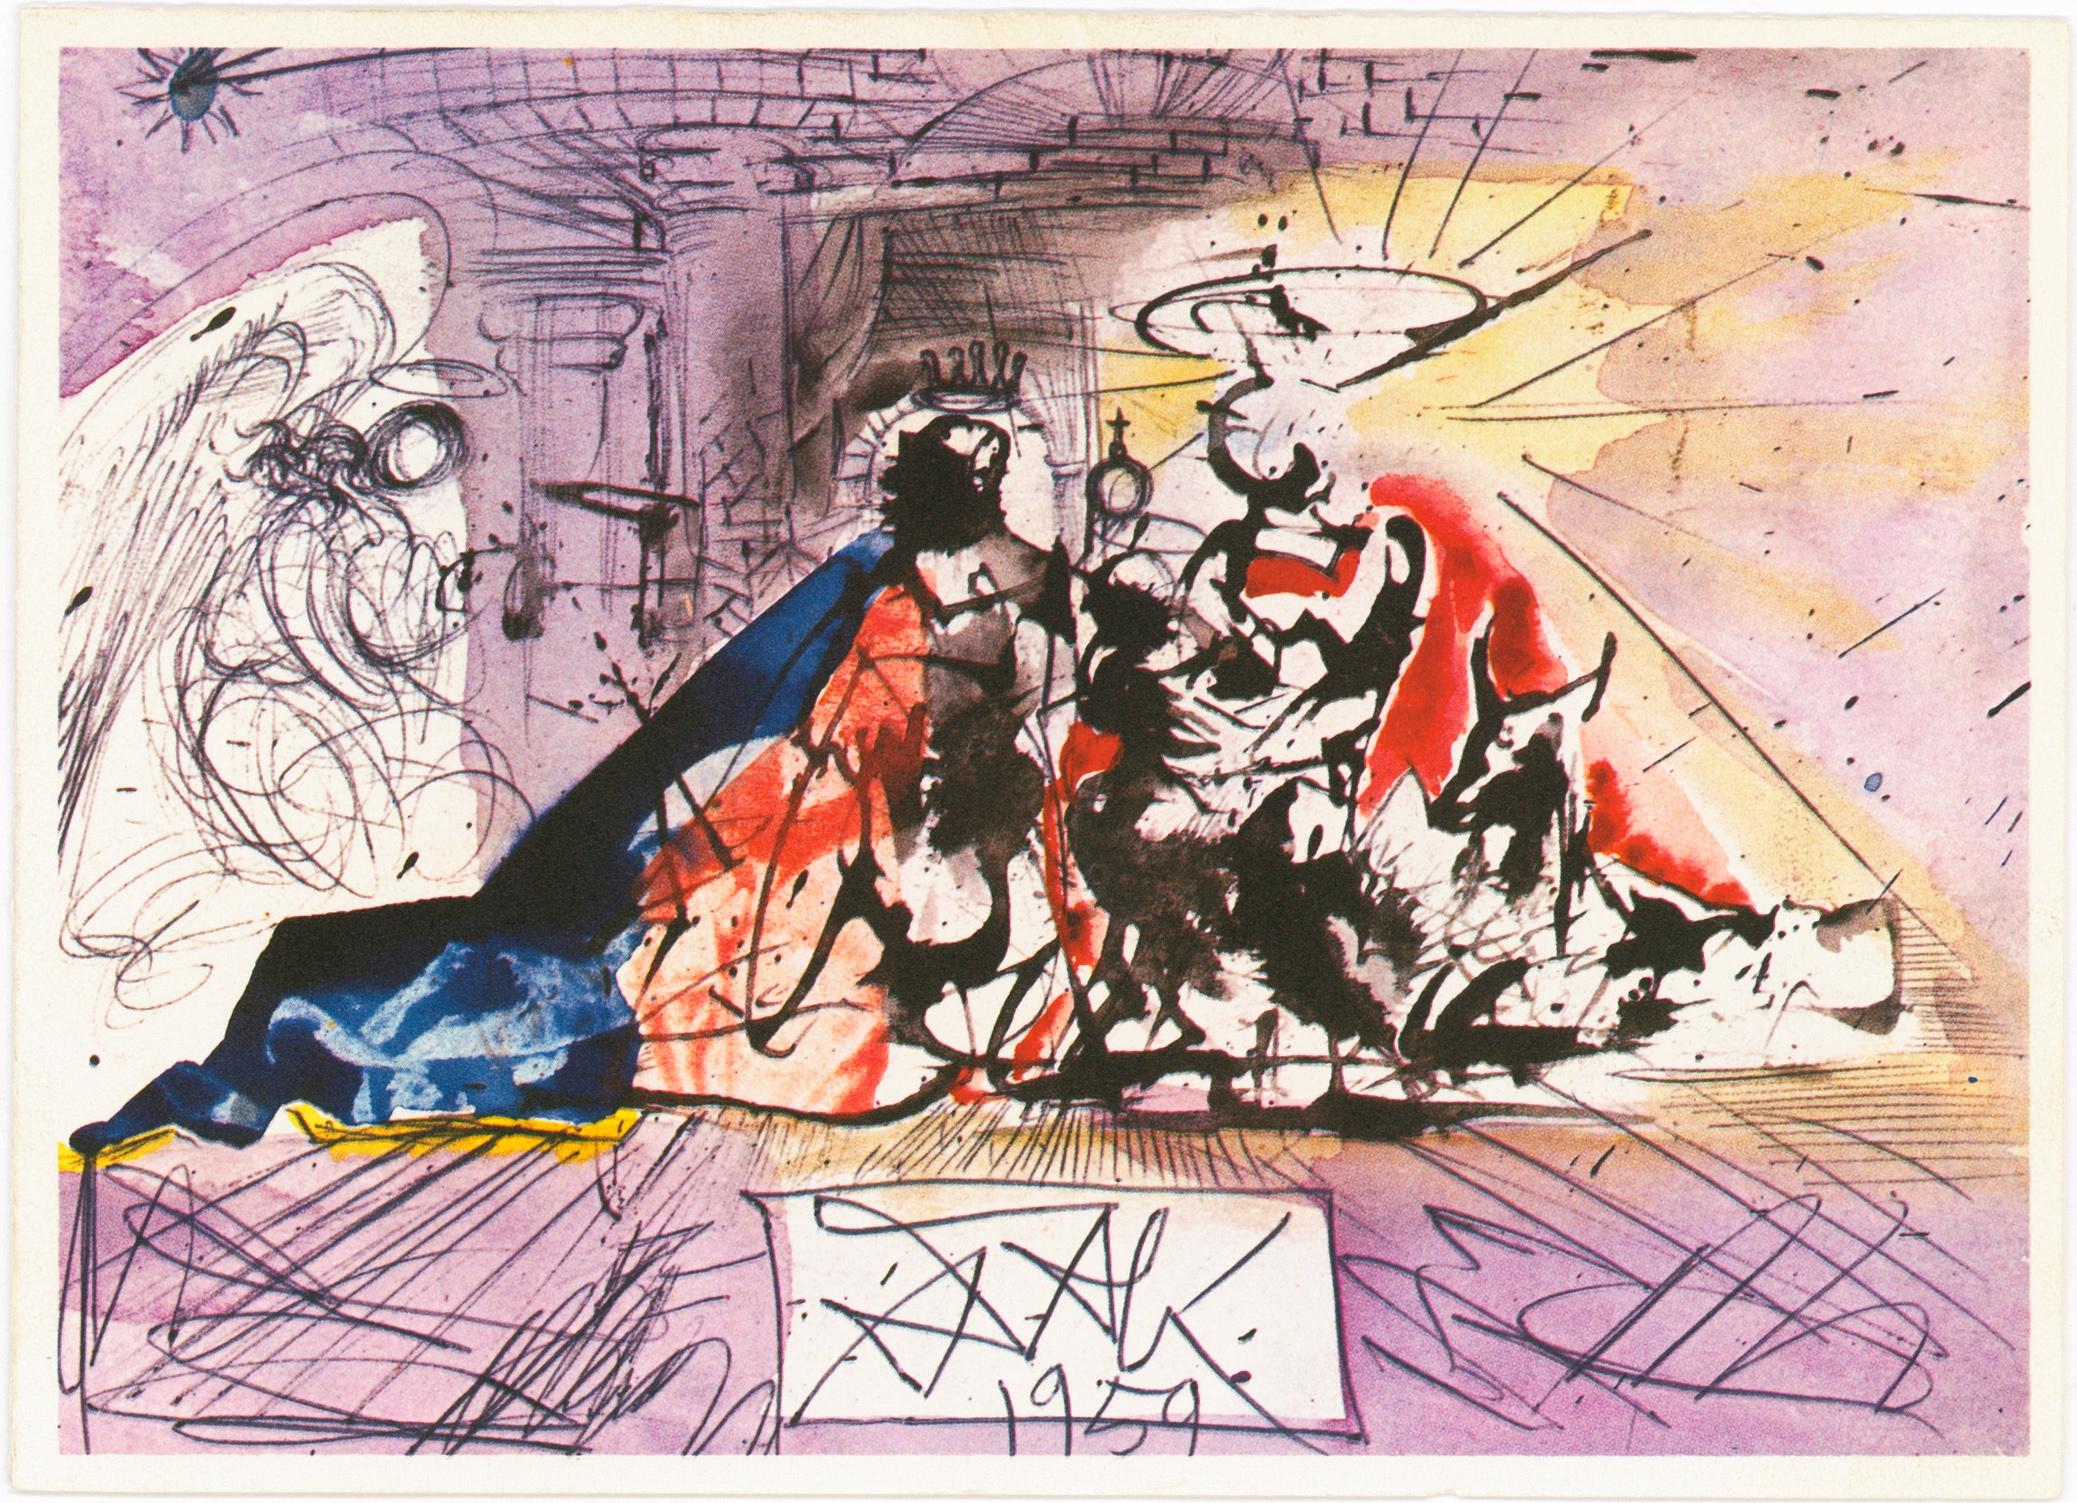 When Salvador Dalí Created Christmas Cards That Were Too Avant Garde for Hallmark (1960)